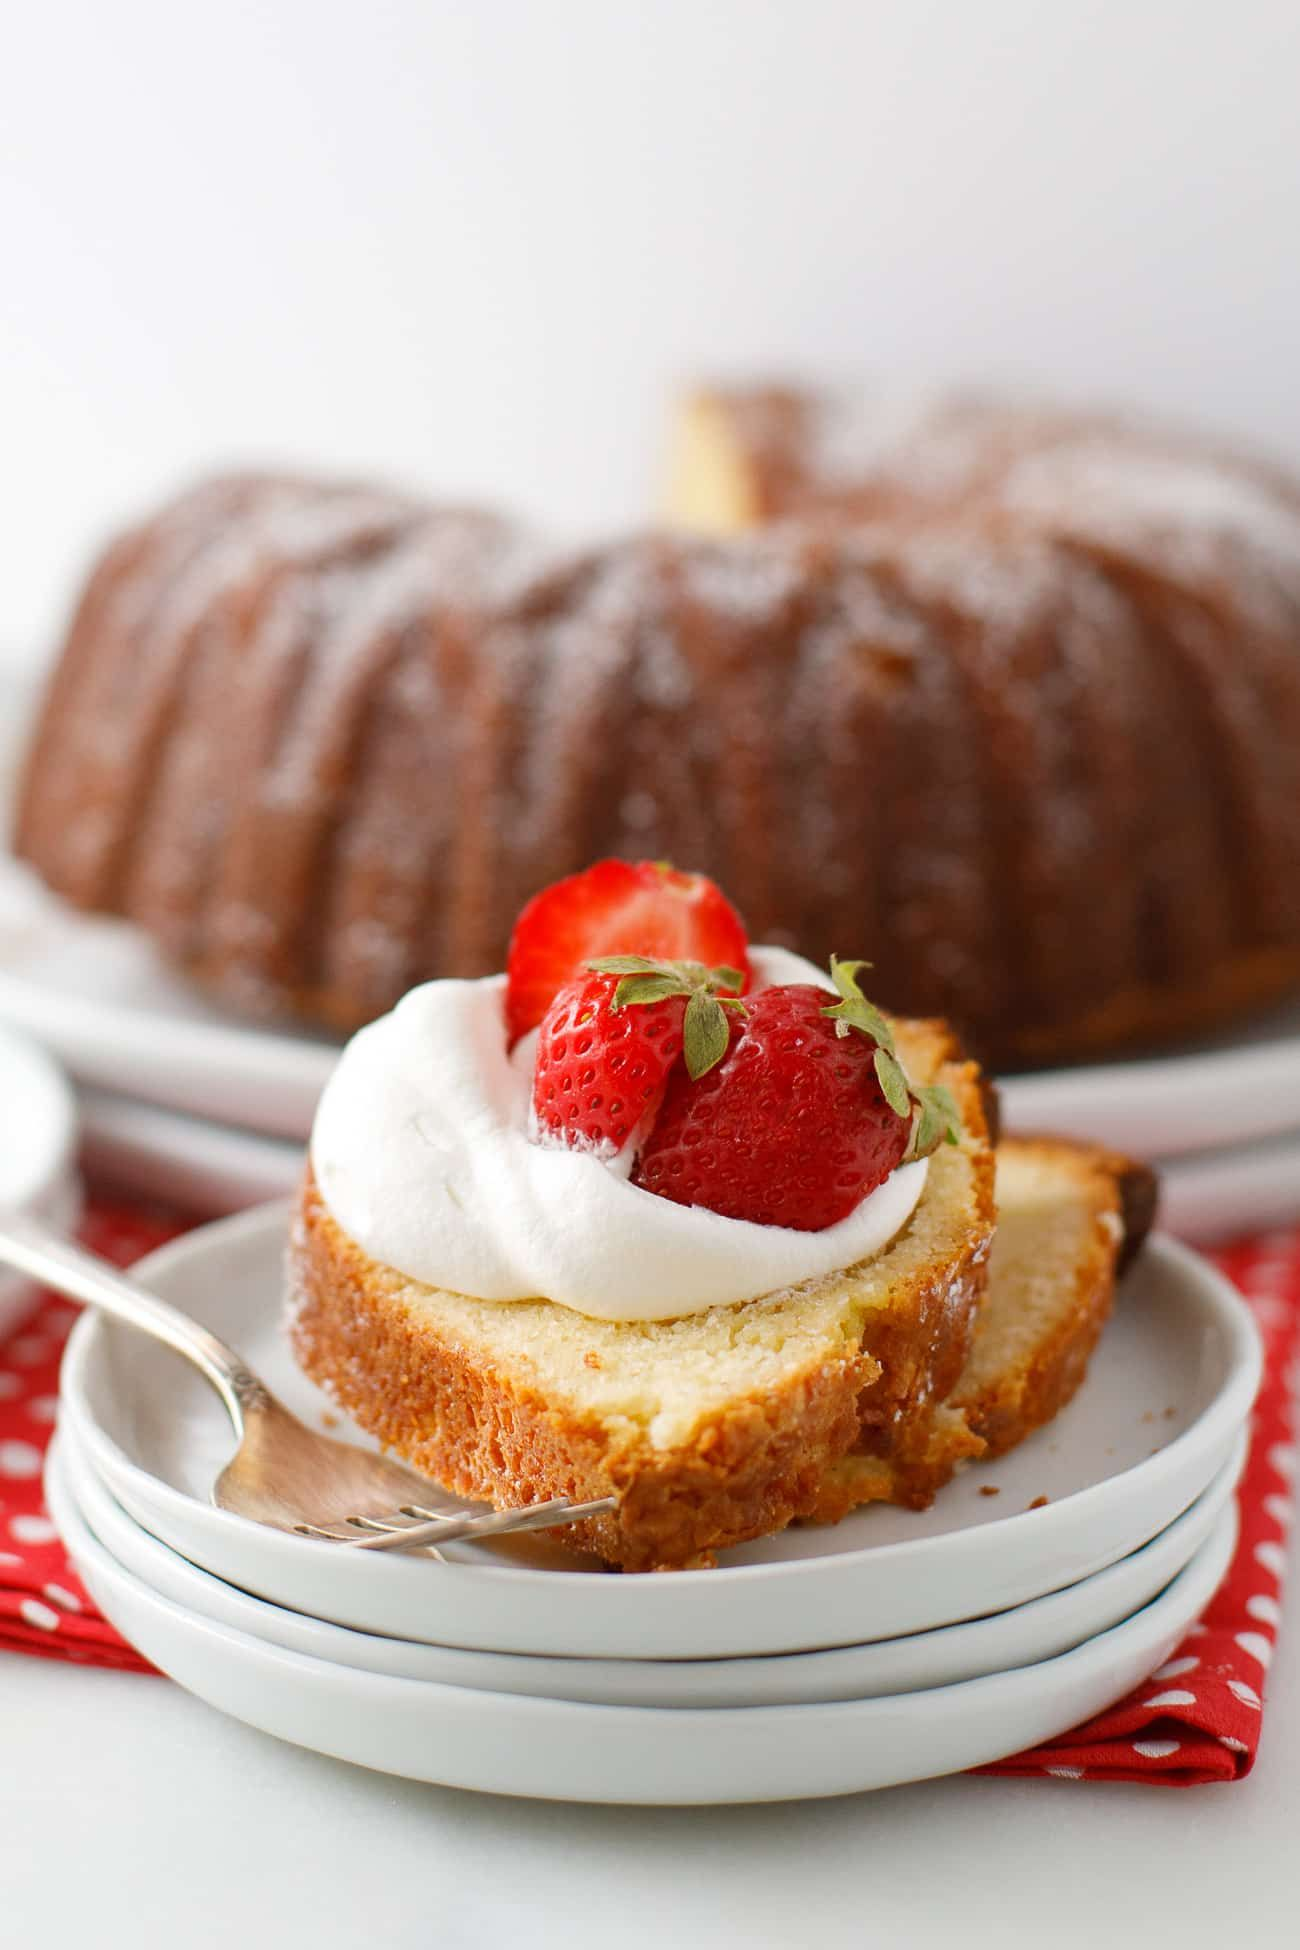 Buttermilk Pound Cake Recipe This Old Fashioned Buttermilk Pound Cake Is Made In A Bundt Cake Pan And Couldn T Be M Pound Cake Buttermilk Pound Cake Desserts